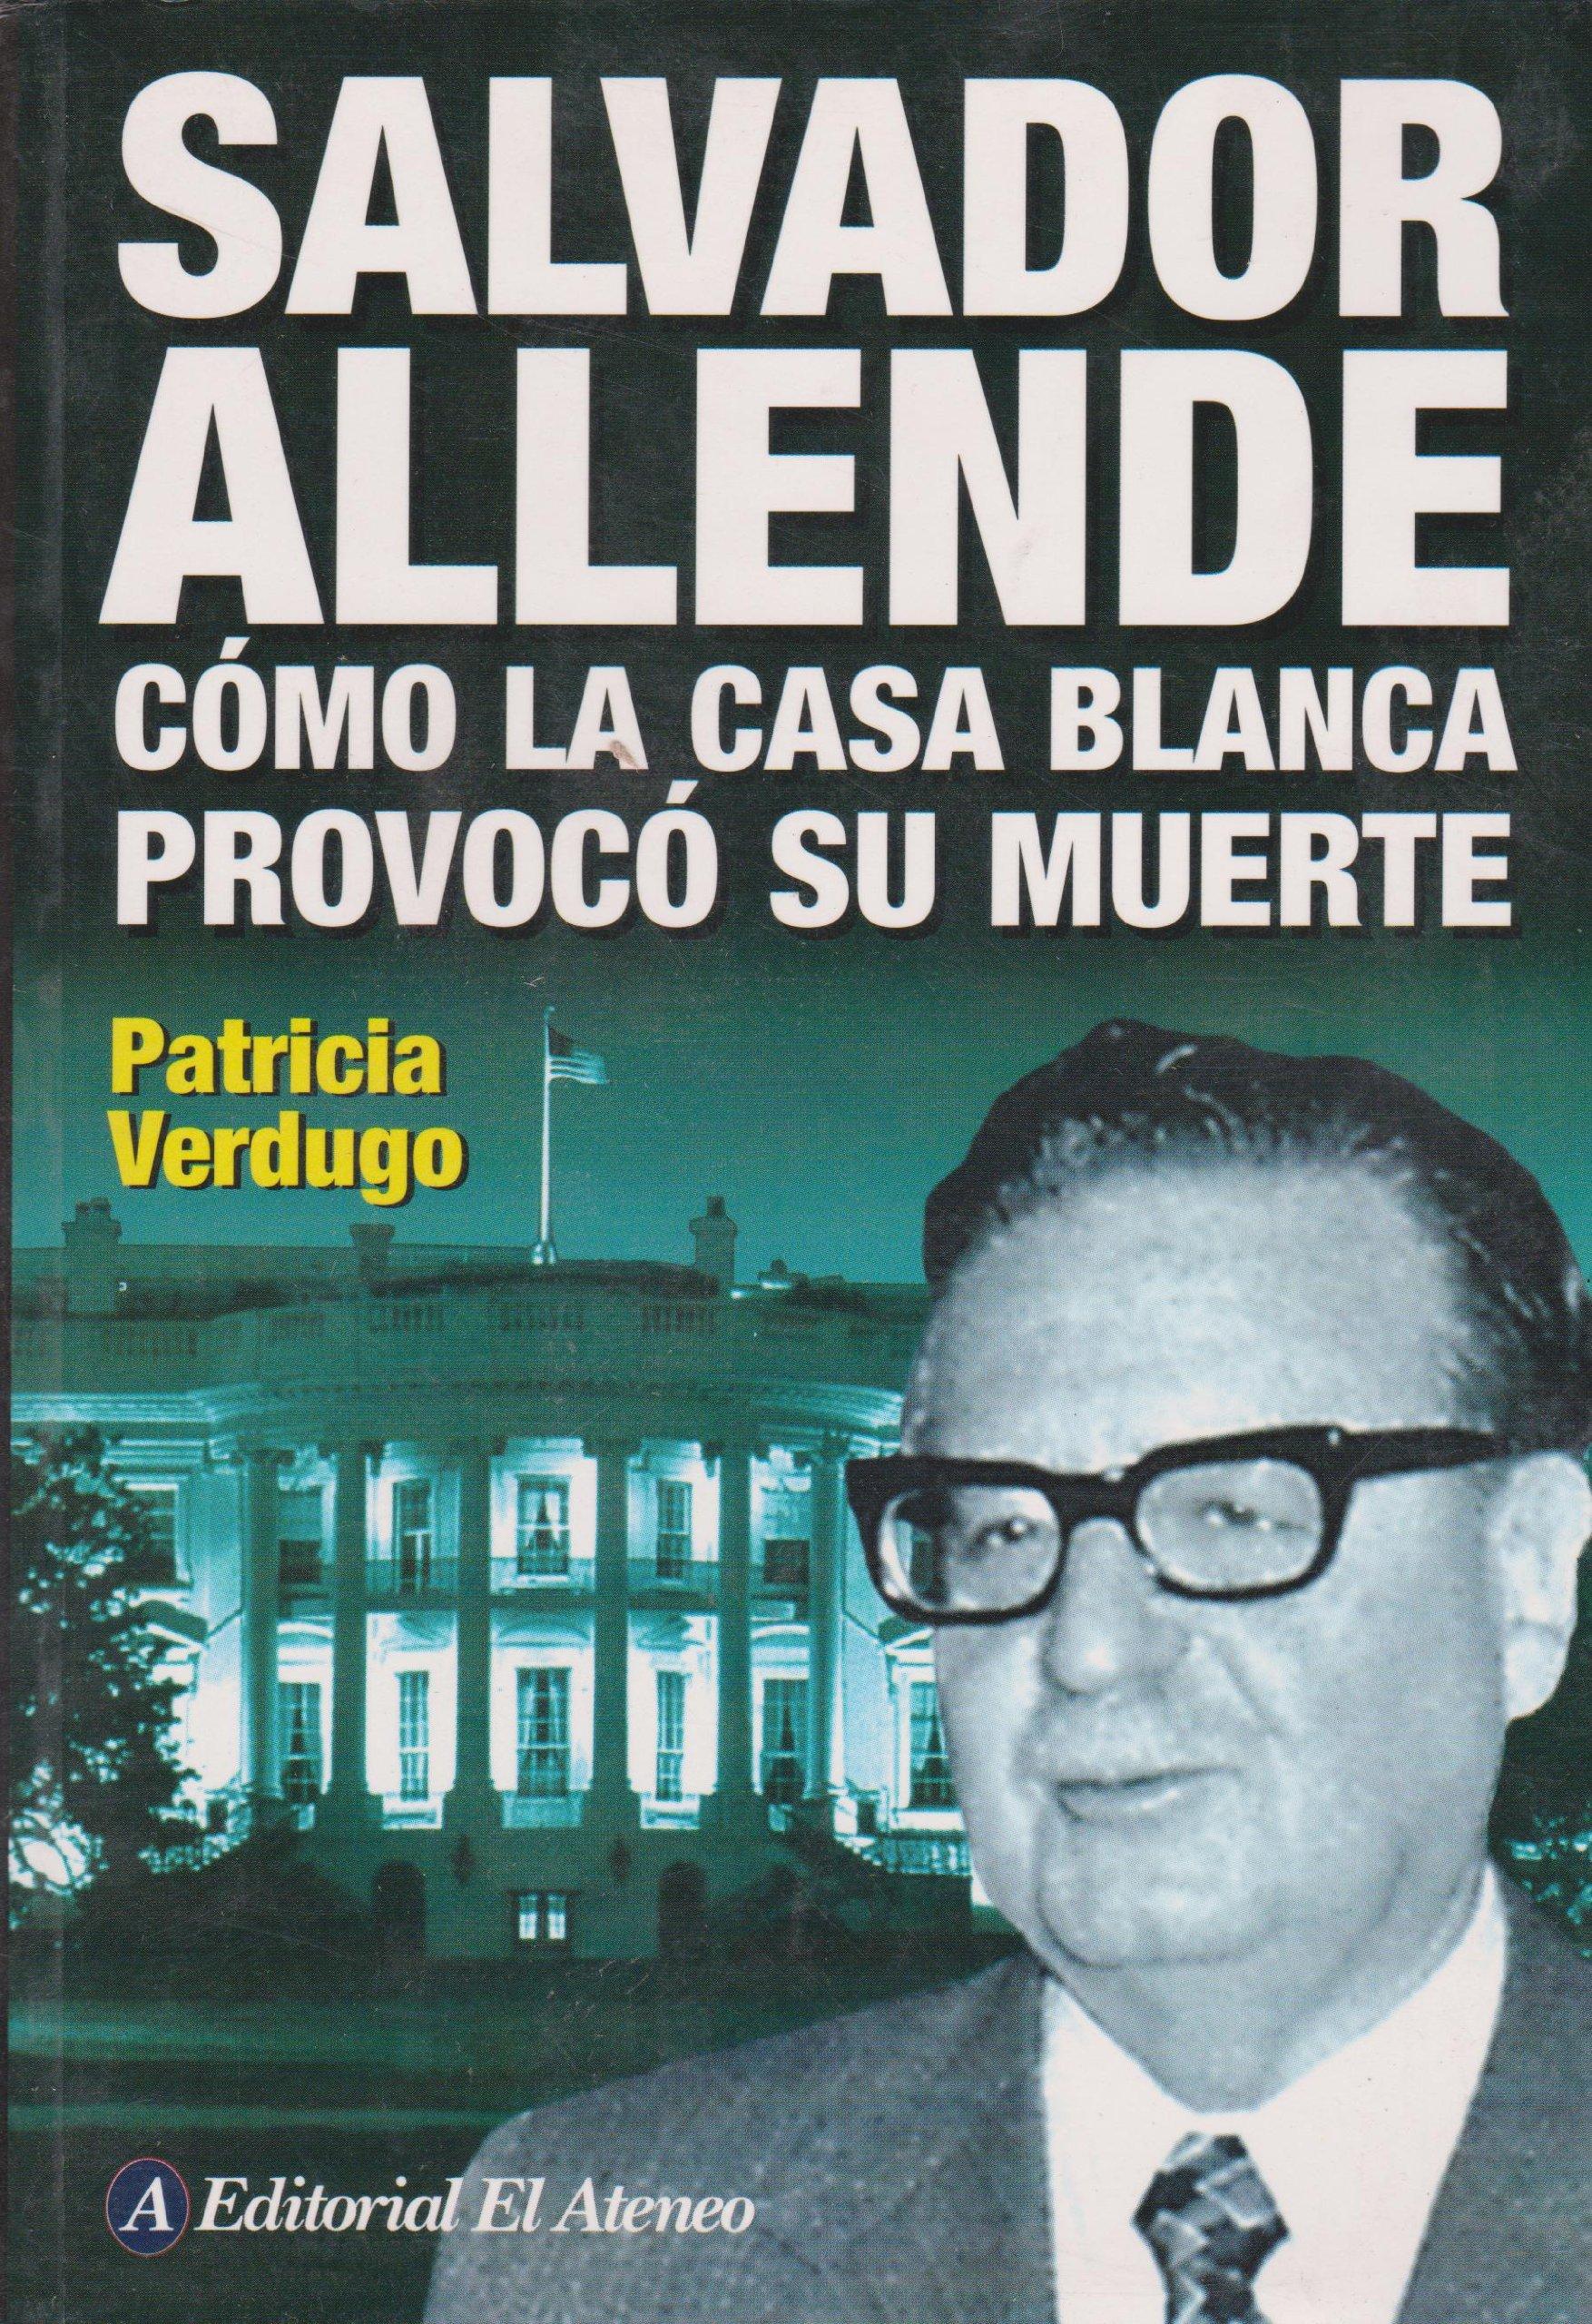 Salvador Allende: Como La Casa Blanca Provoco Su Muerte / How the White House Provoked his Death (Spanish Edition)